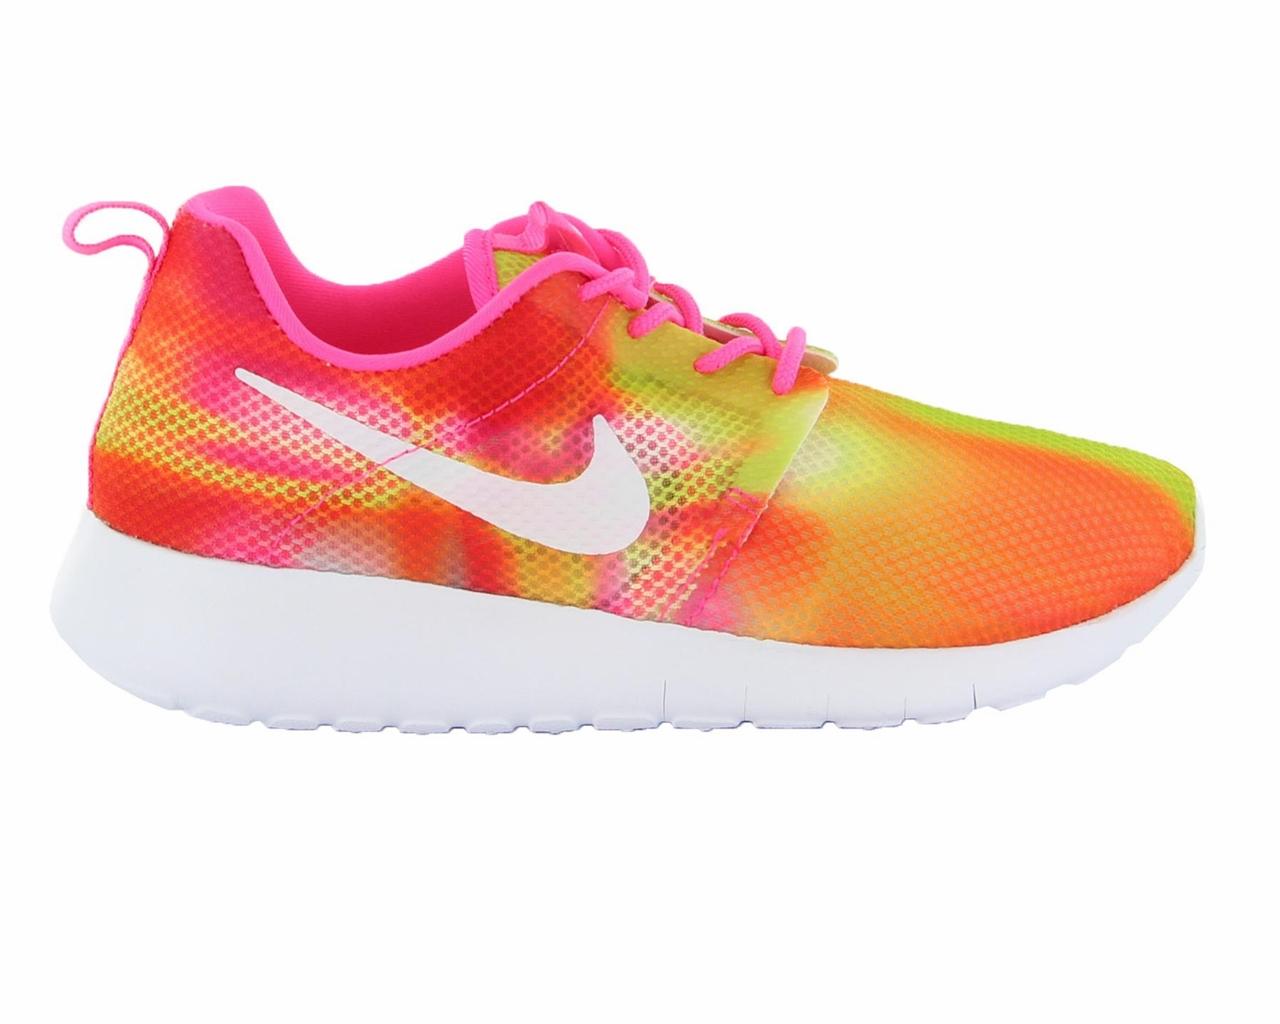 Nike Roshe One girls sneakers -65% @ Soccerfanshop